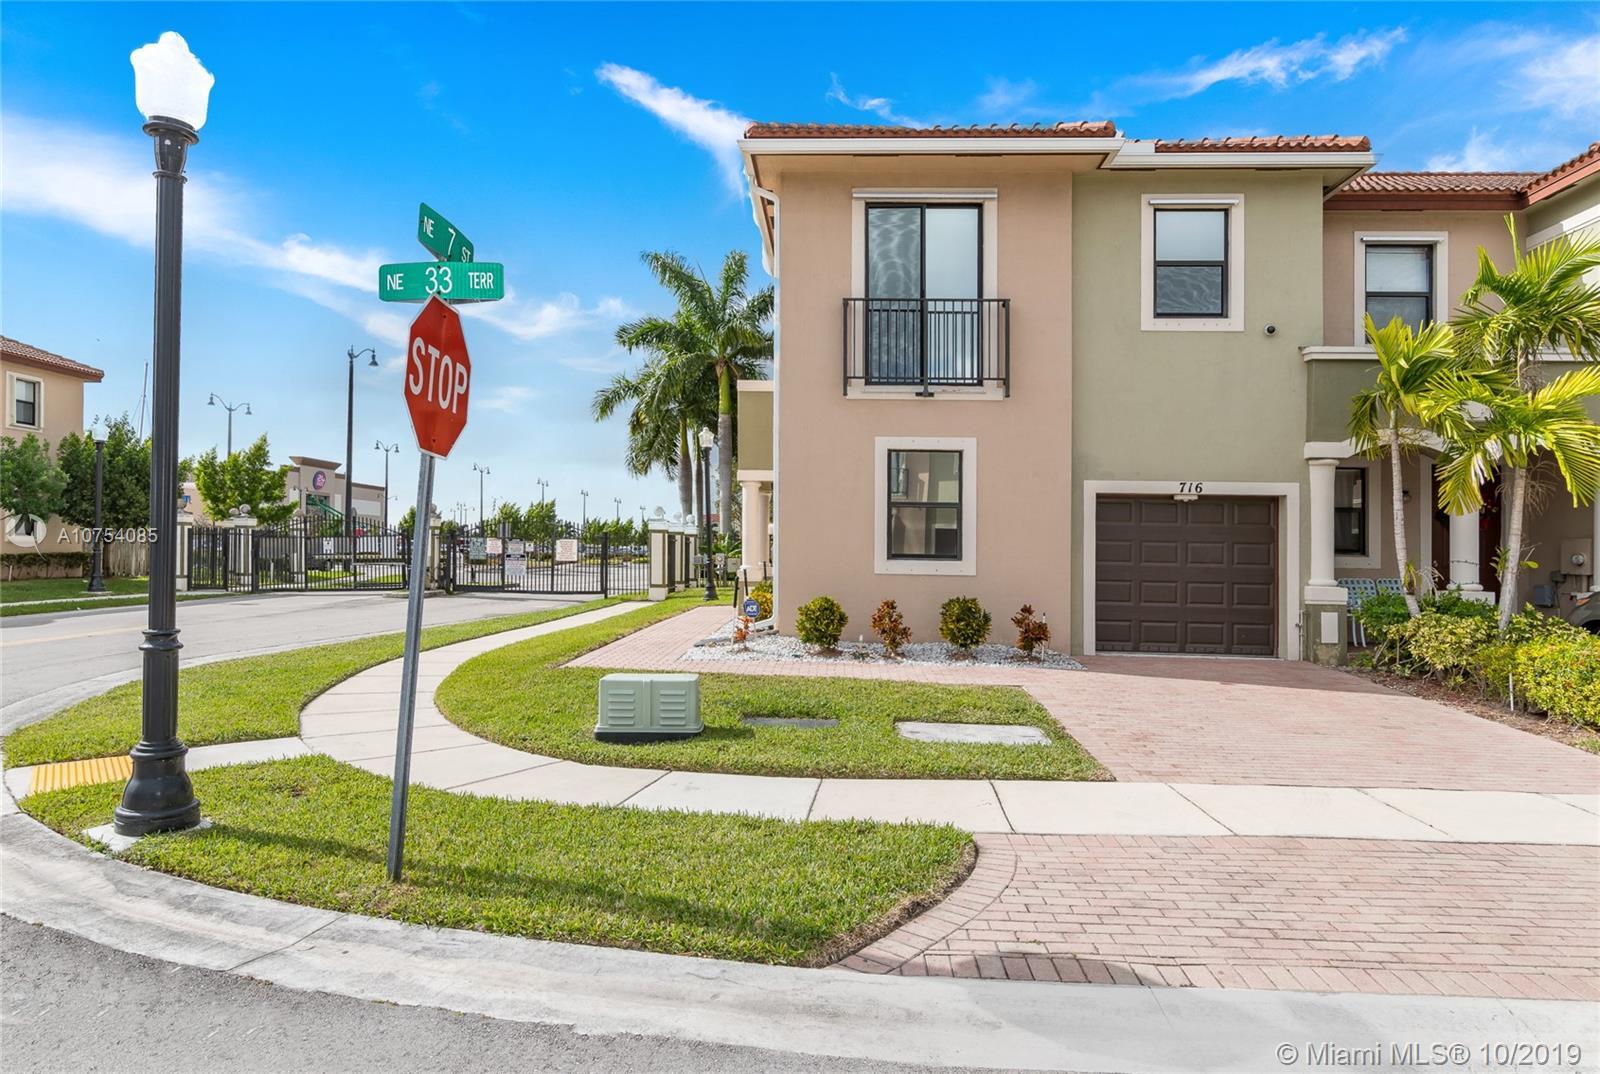 716 NE 33rd Ter #716, Homestead, FL 33033 - Homestead, FL real estate listing